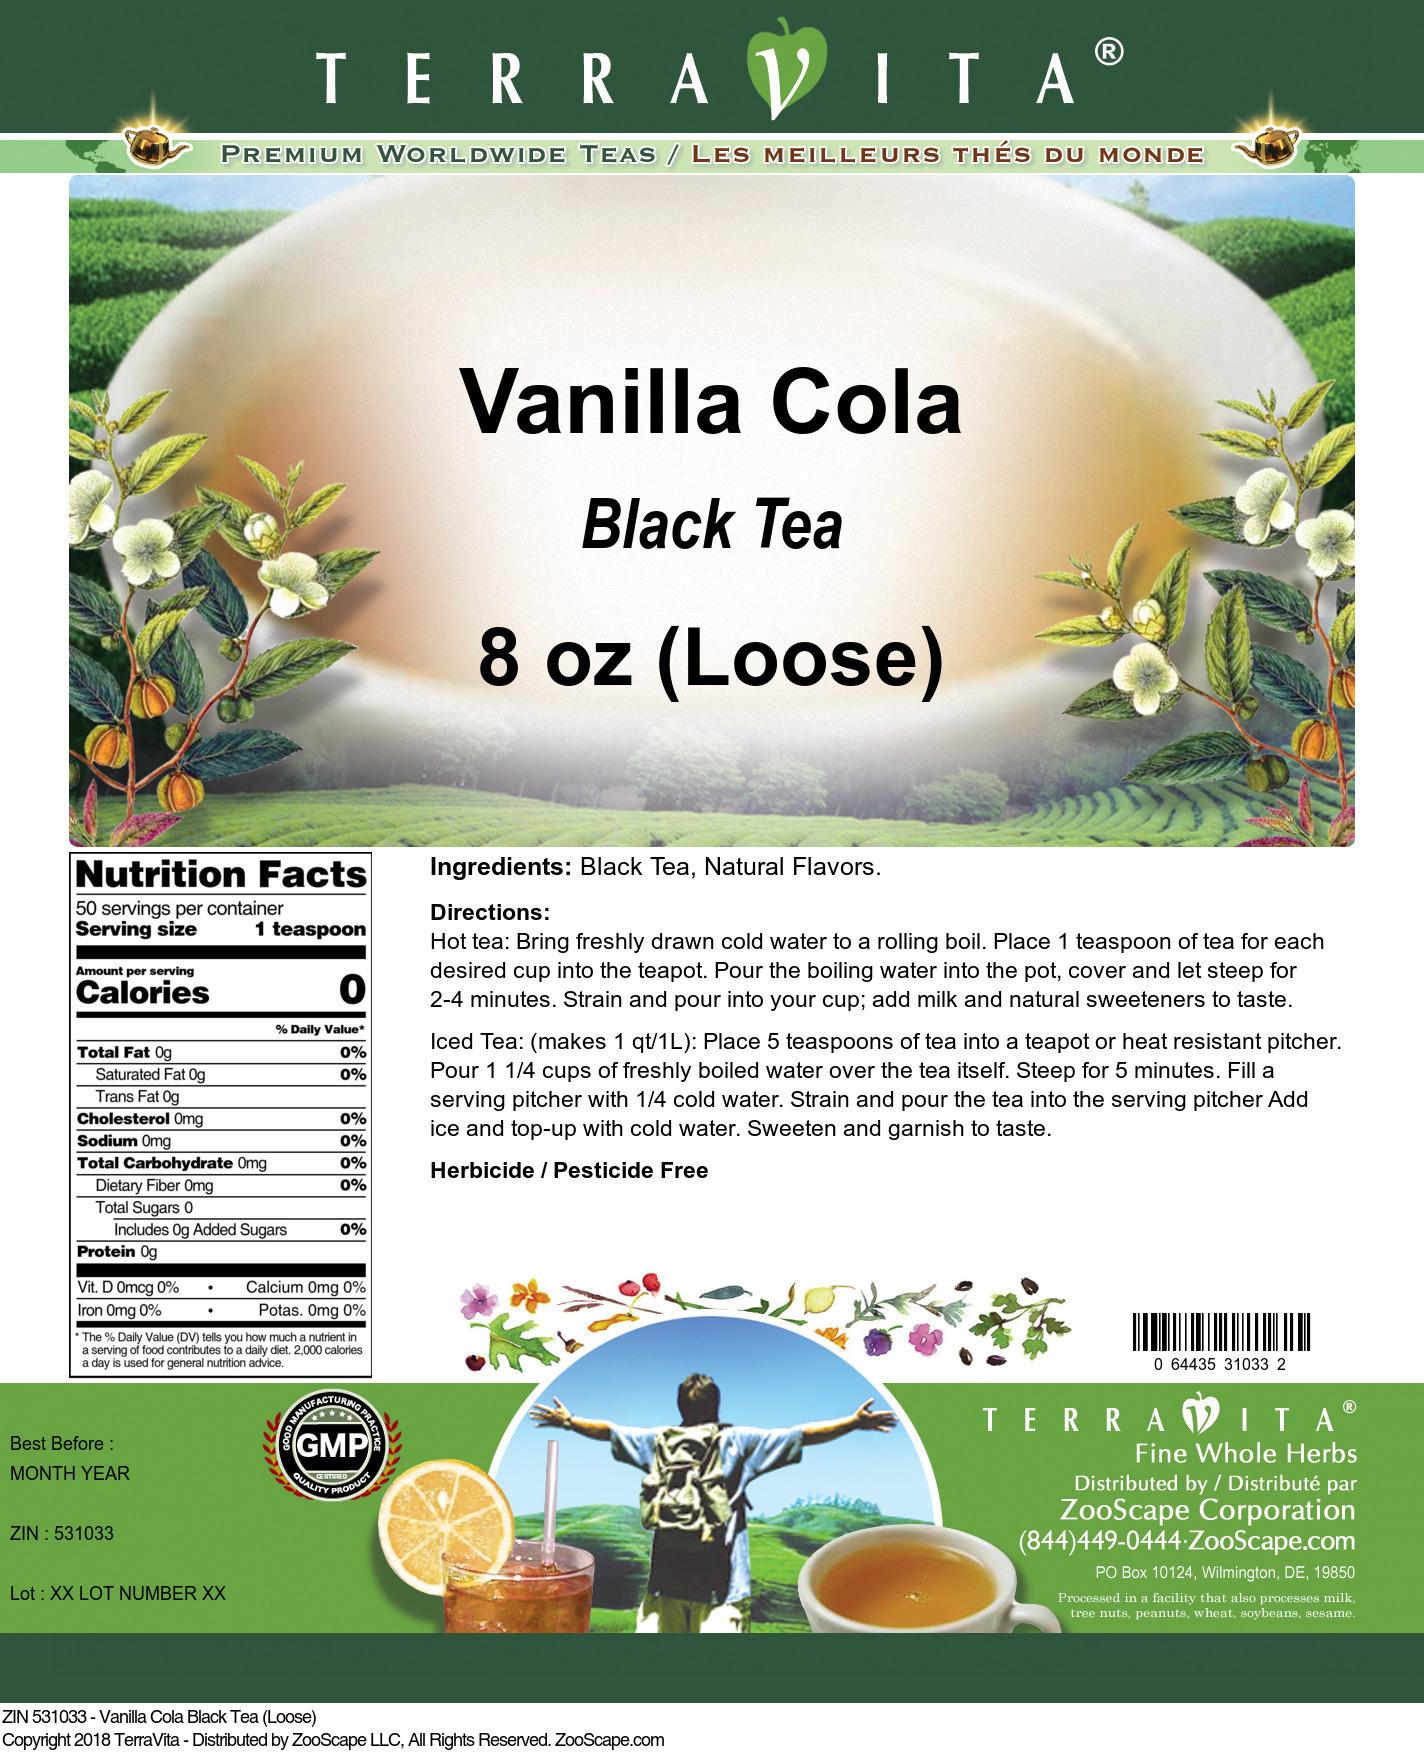 Vanilla Cola Black Tea (Loose)